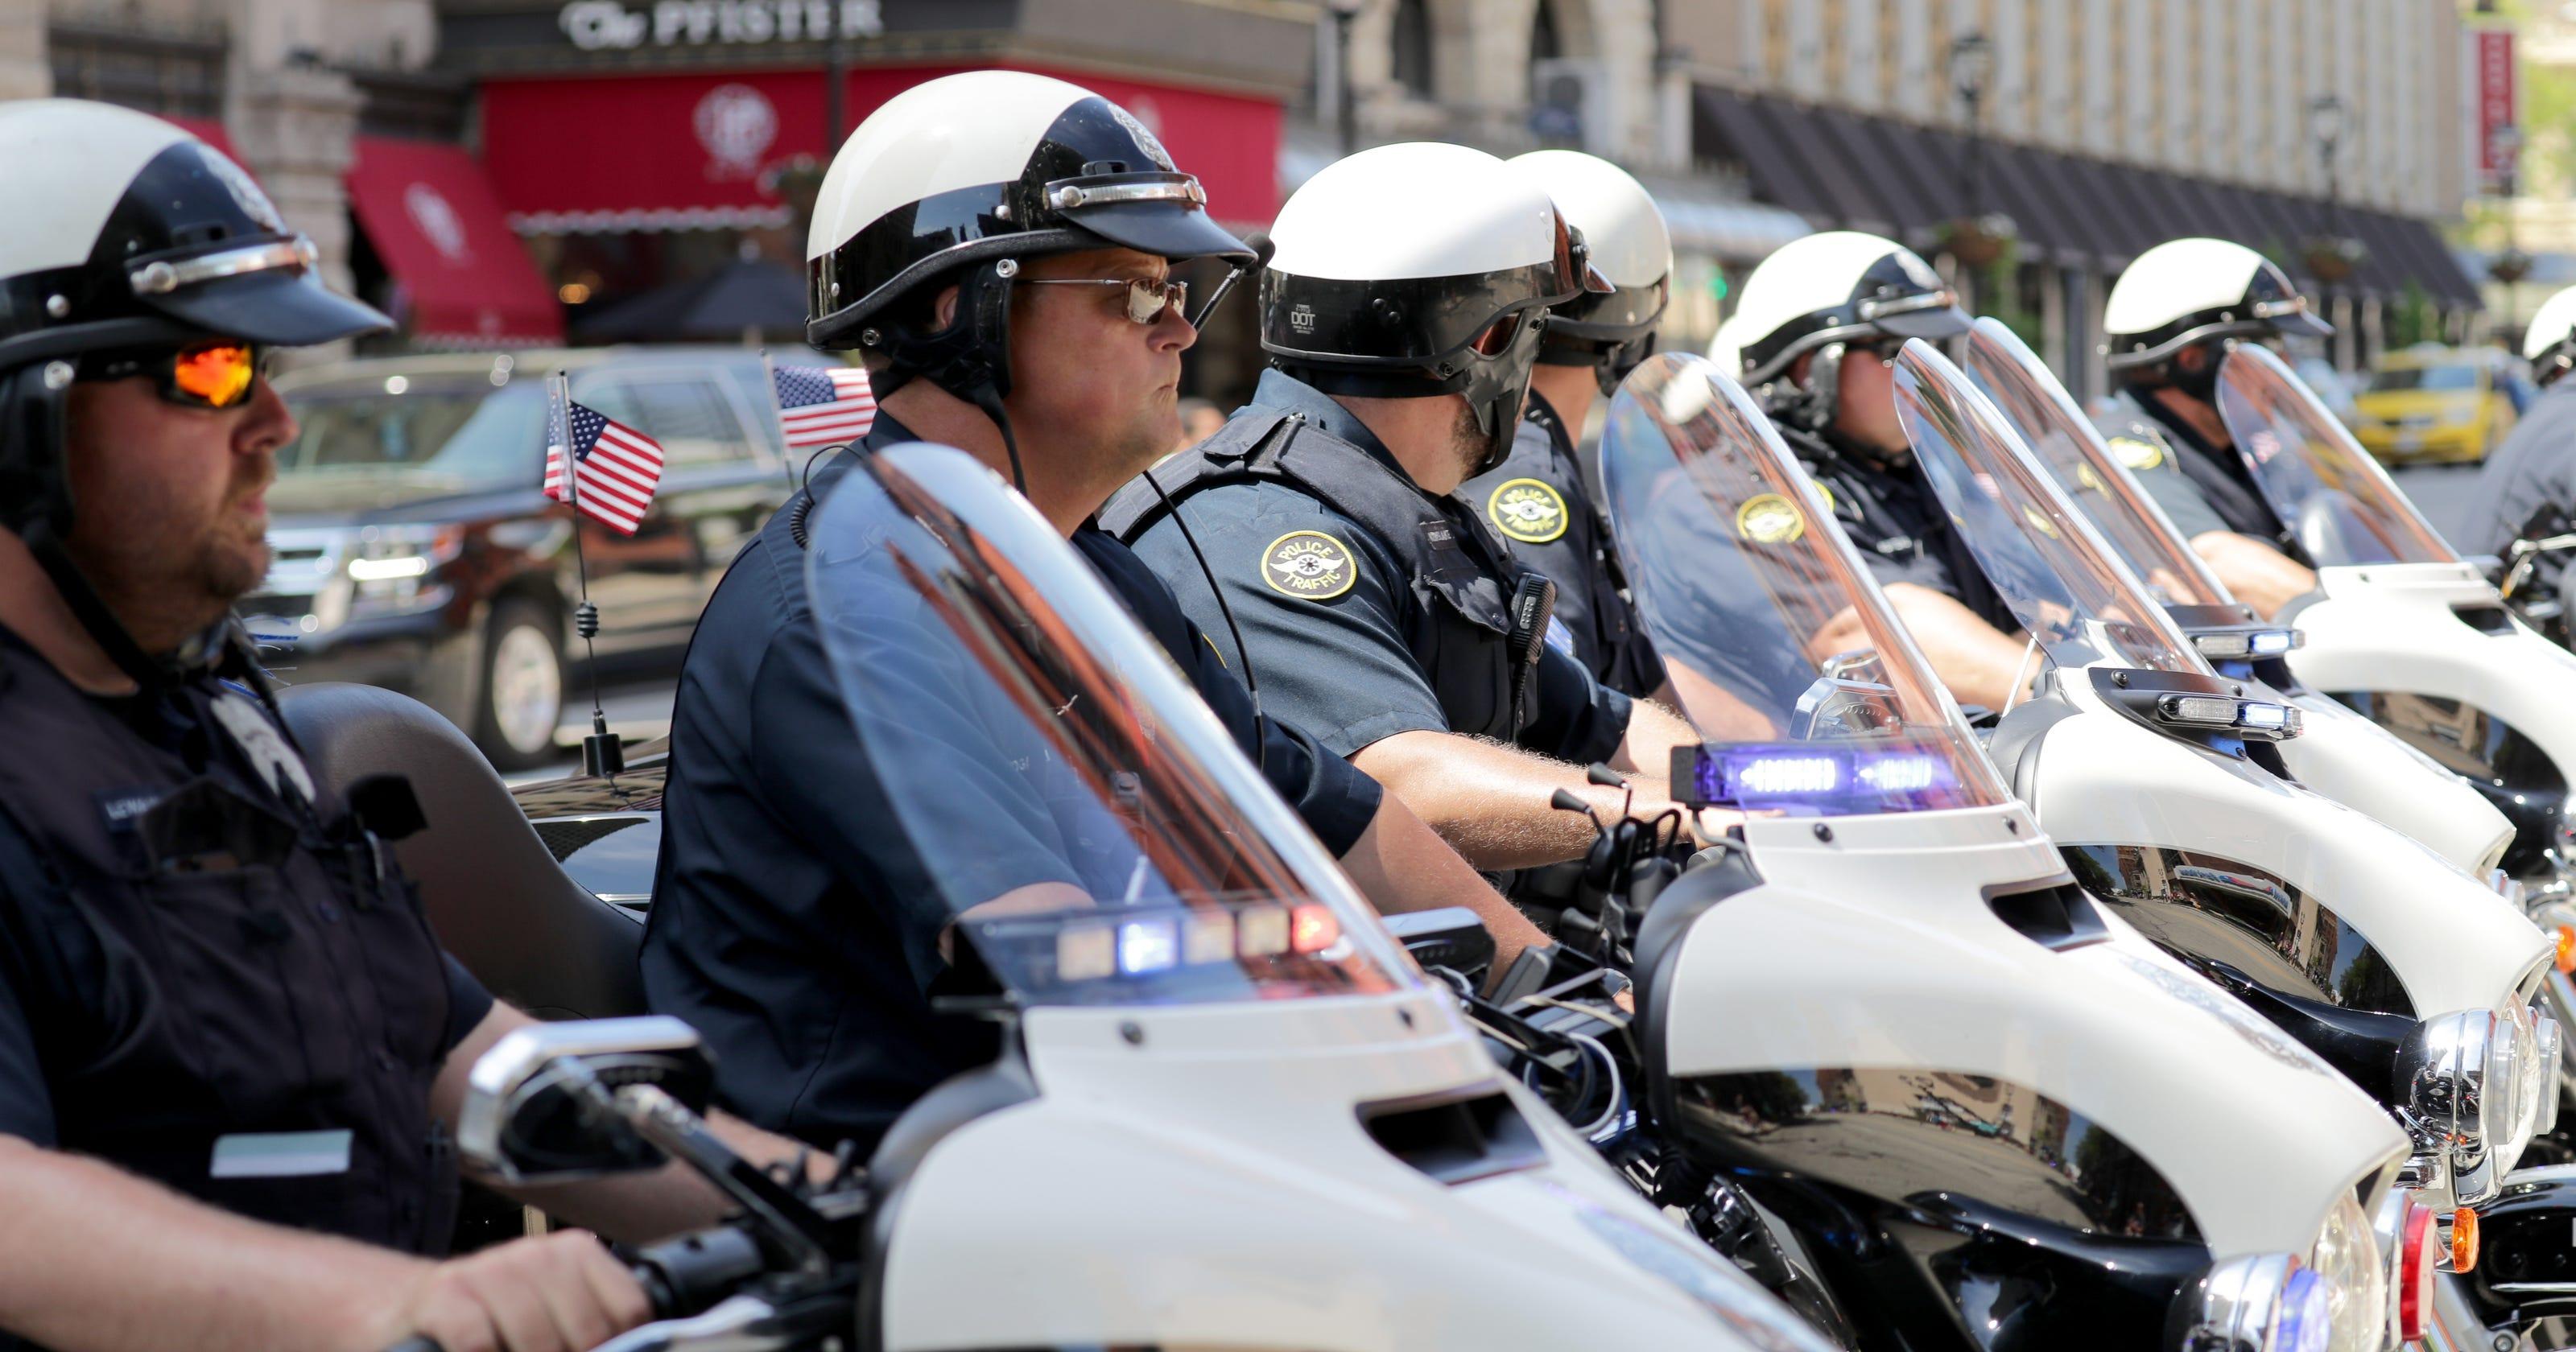 secret service buys harley davidson motorcycles despite trump feud